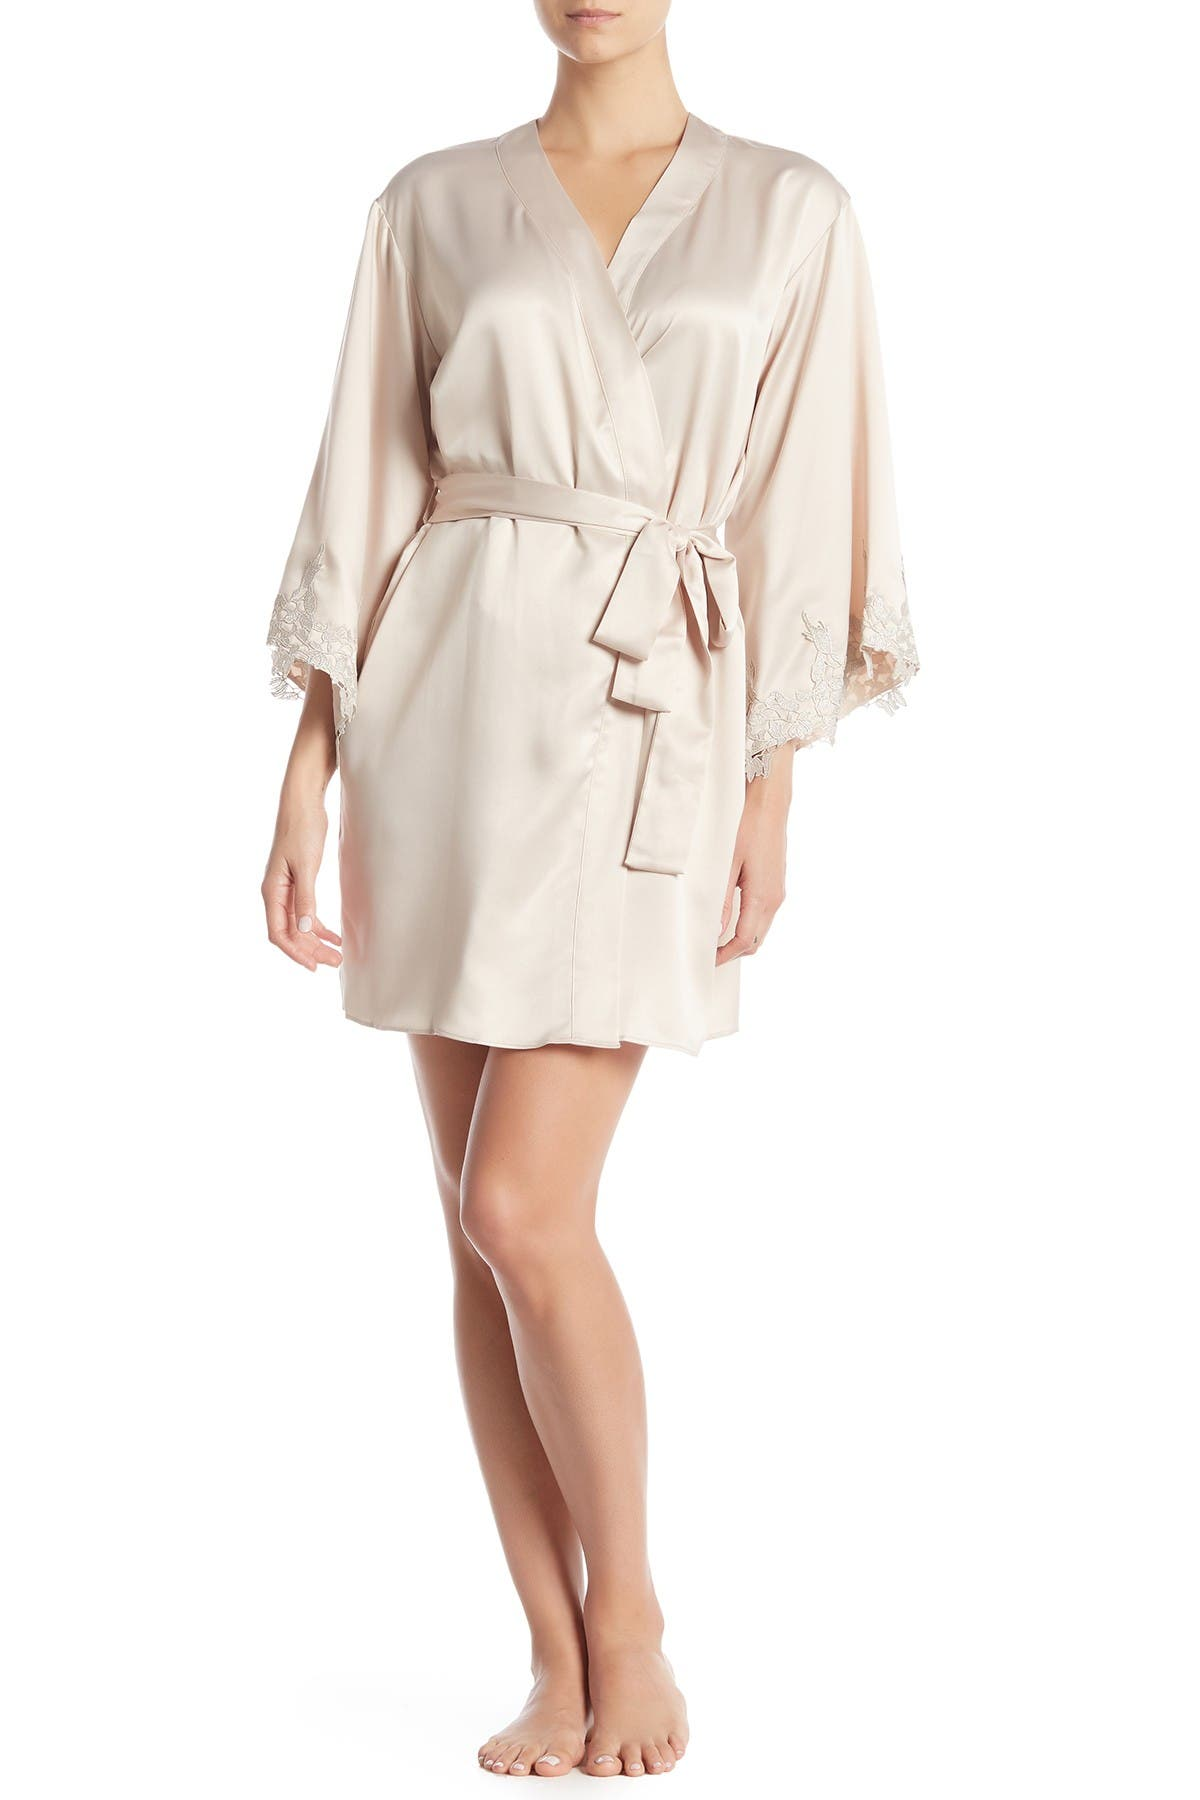 Image of Flora Nikrooz Sleepwear Alessia Charm Satin Robe